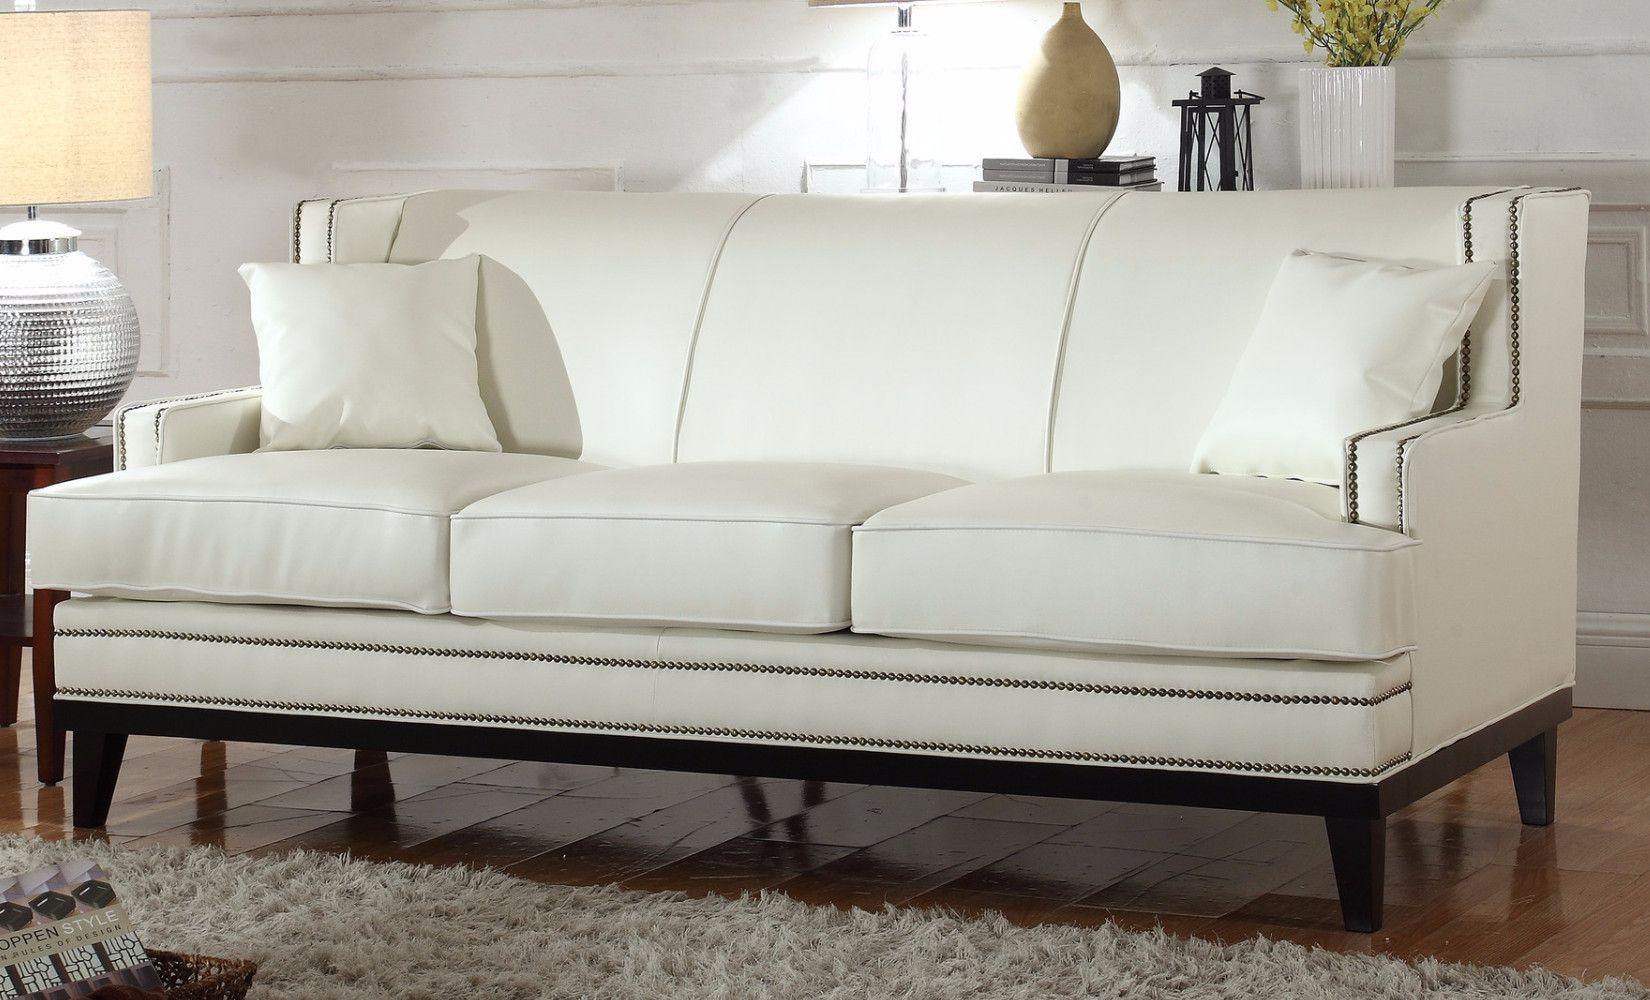 Modern Soft Bonded Leather Sofa With Nailhead Trim Details White Leather Sofa Sale Genuine Leather Furniture Leather Sofa